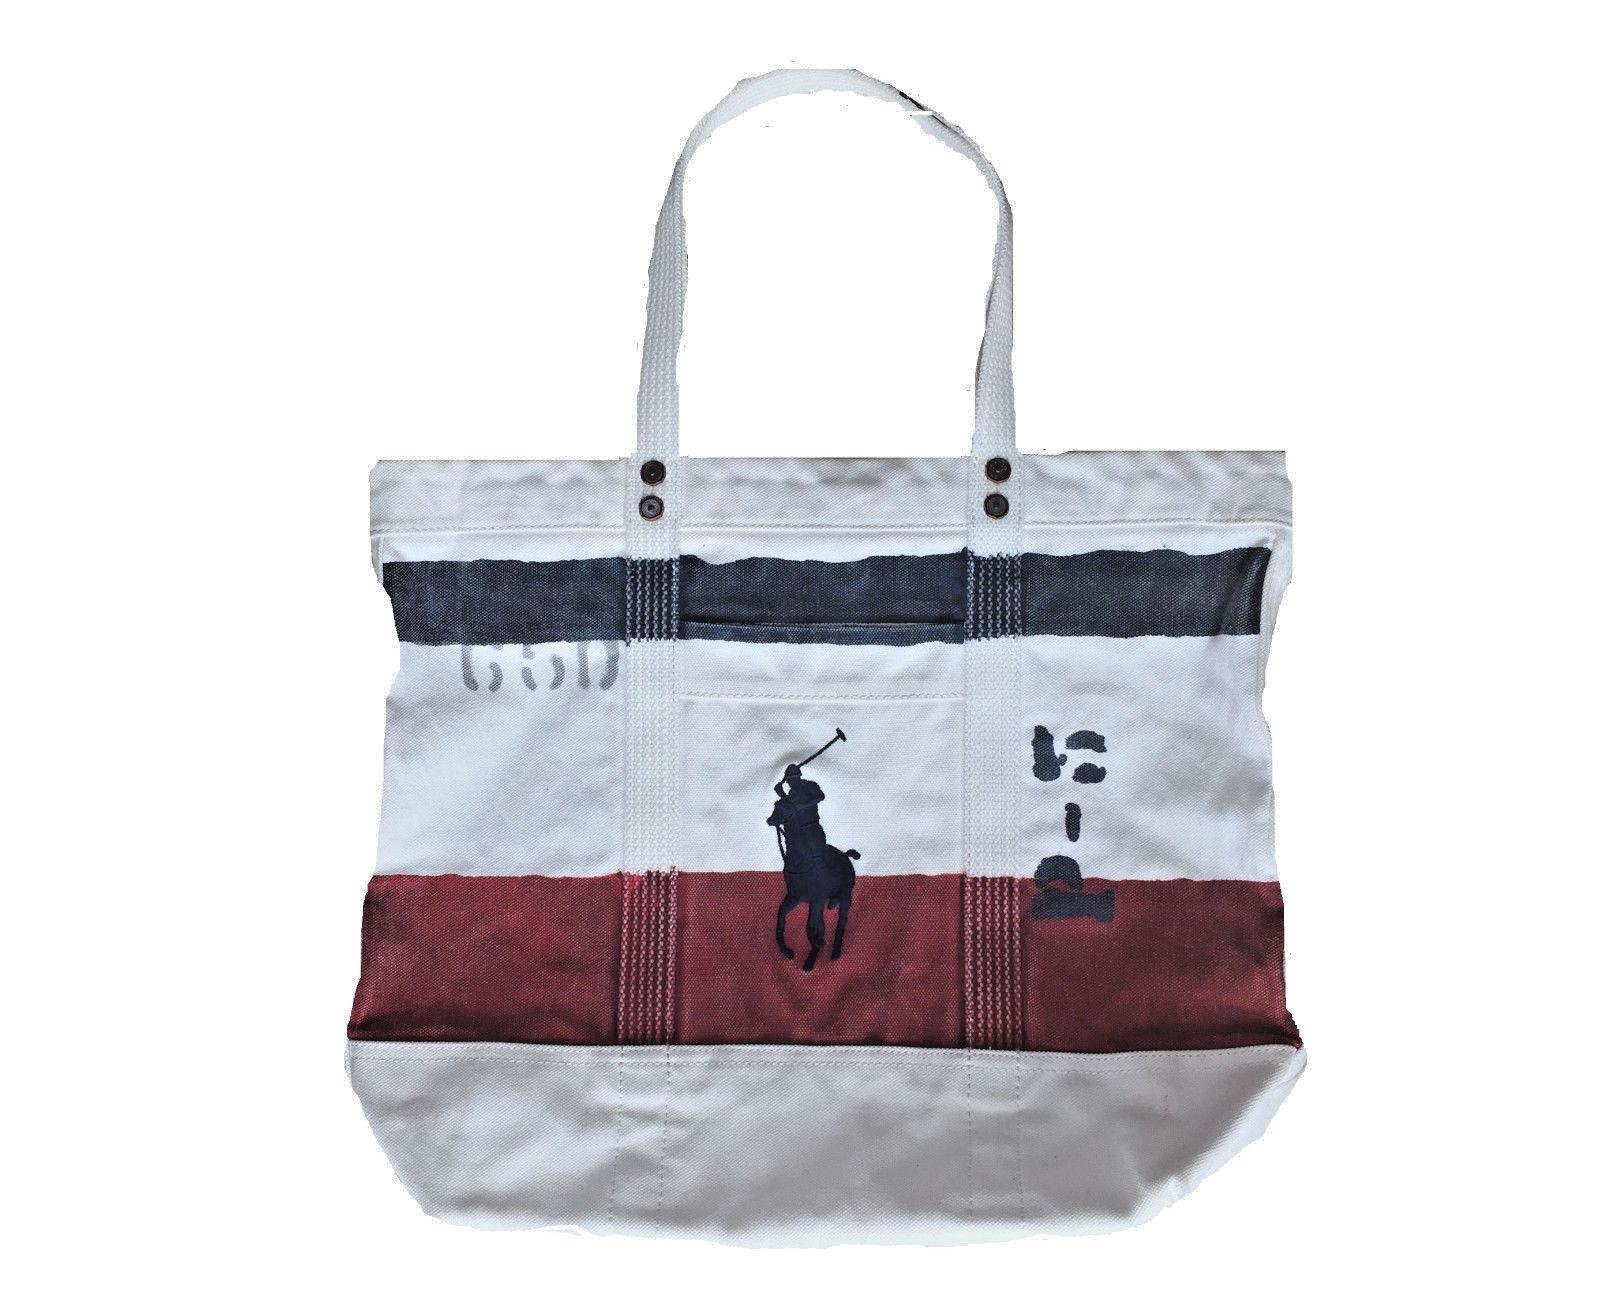 e7e97b1d76 Polo Ralph Lauren Big Pony Canvas Multi-colored Striped Zippered Tote Bag -  £55.92 GBP